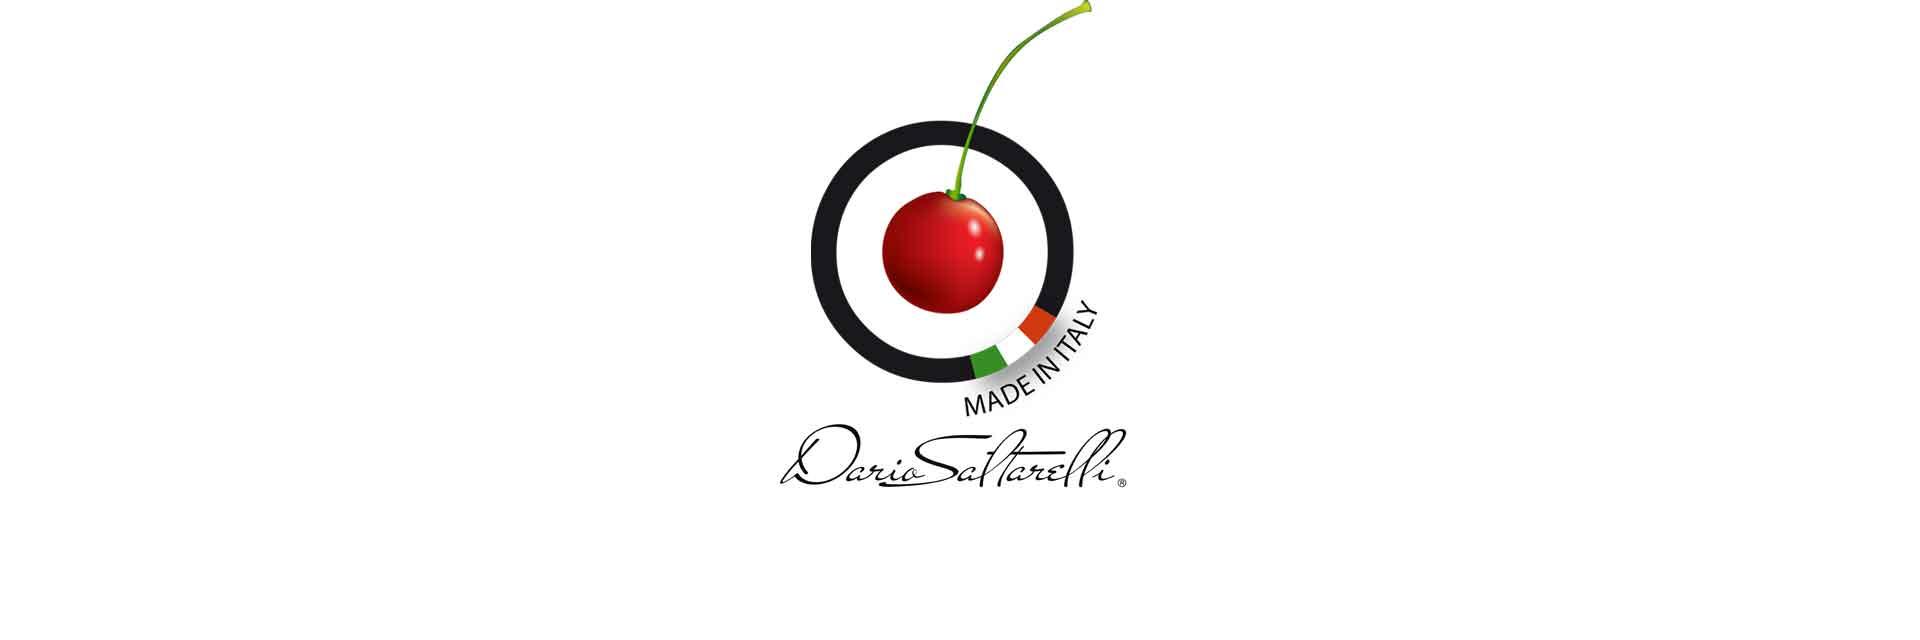 logo-dario-saltarelli-1920x1280-1024x683-2